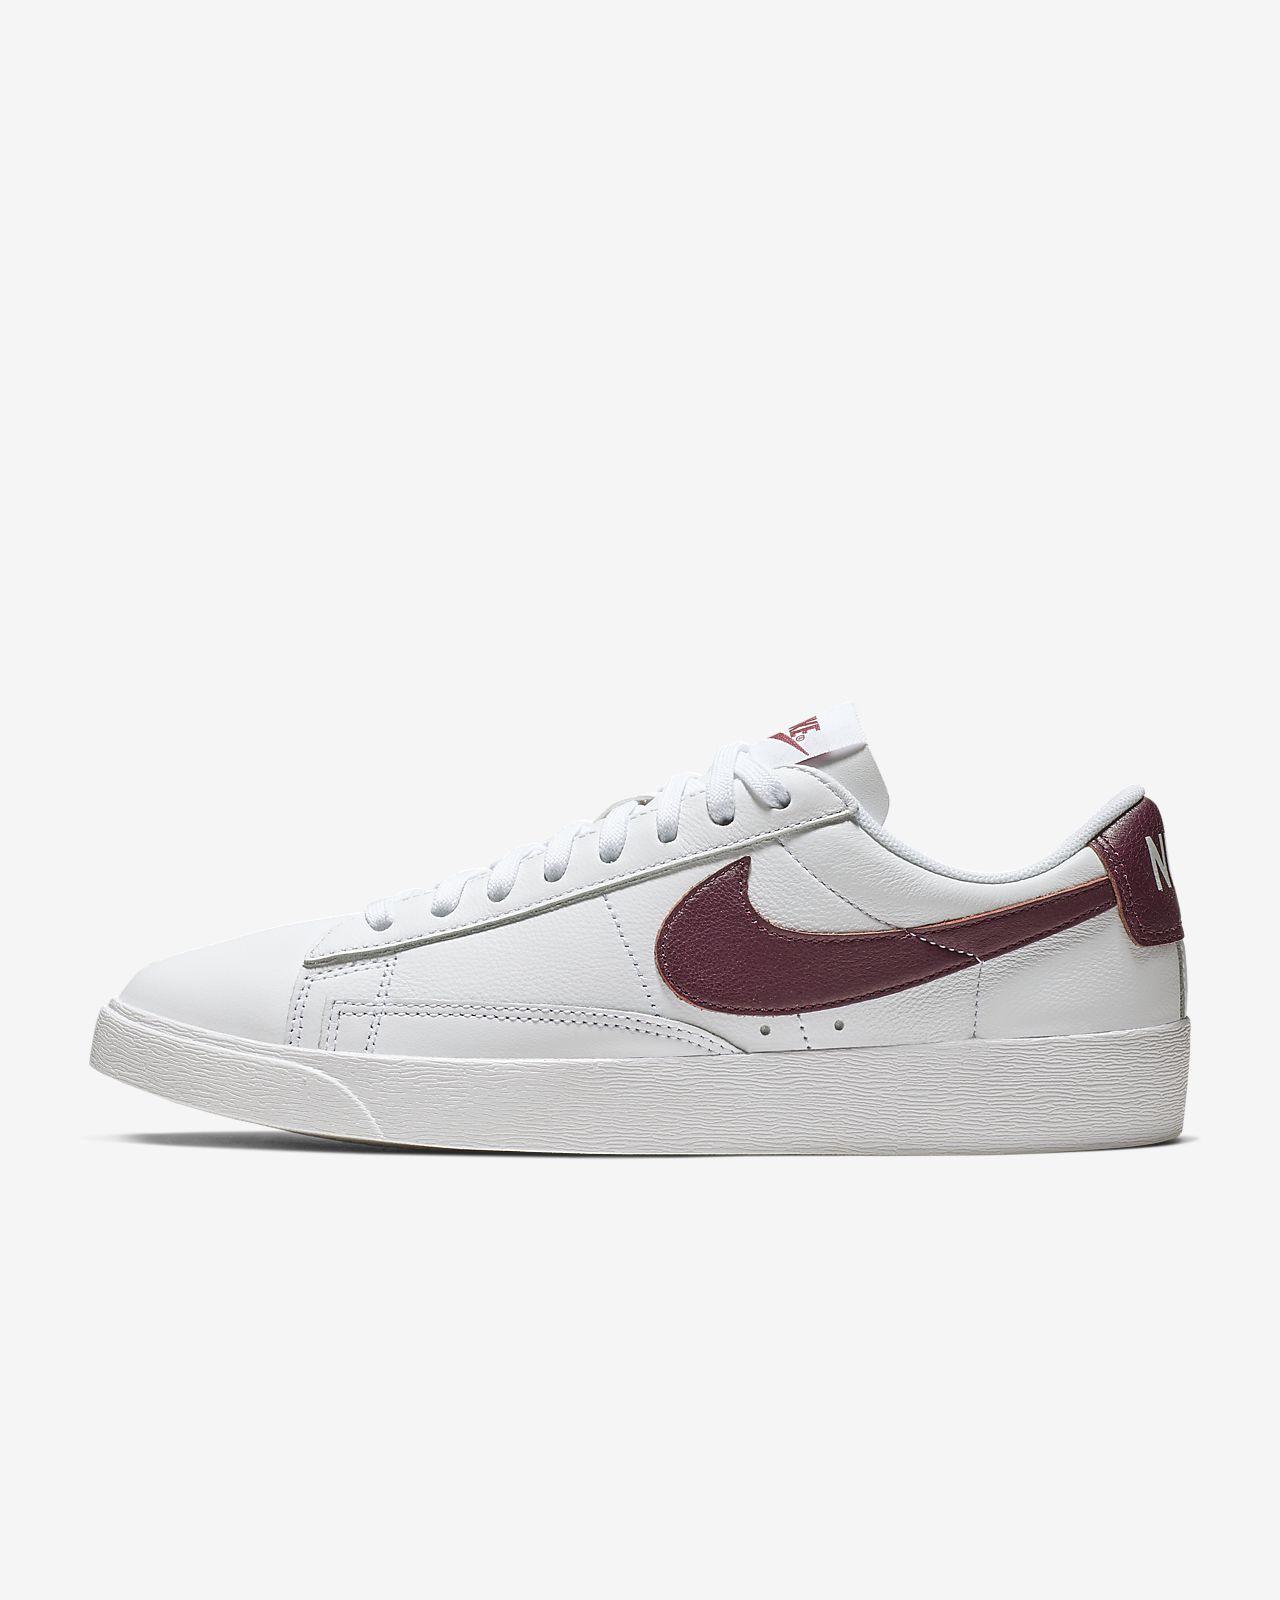 promo code 3a483 786ae Nike blazer bordeaux low